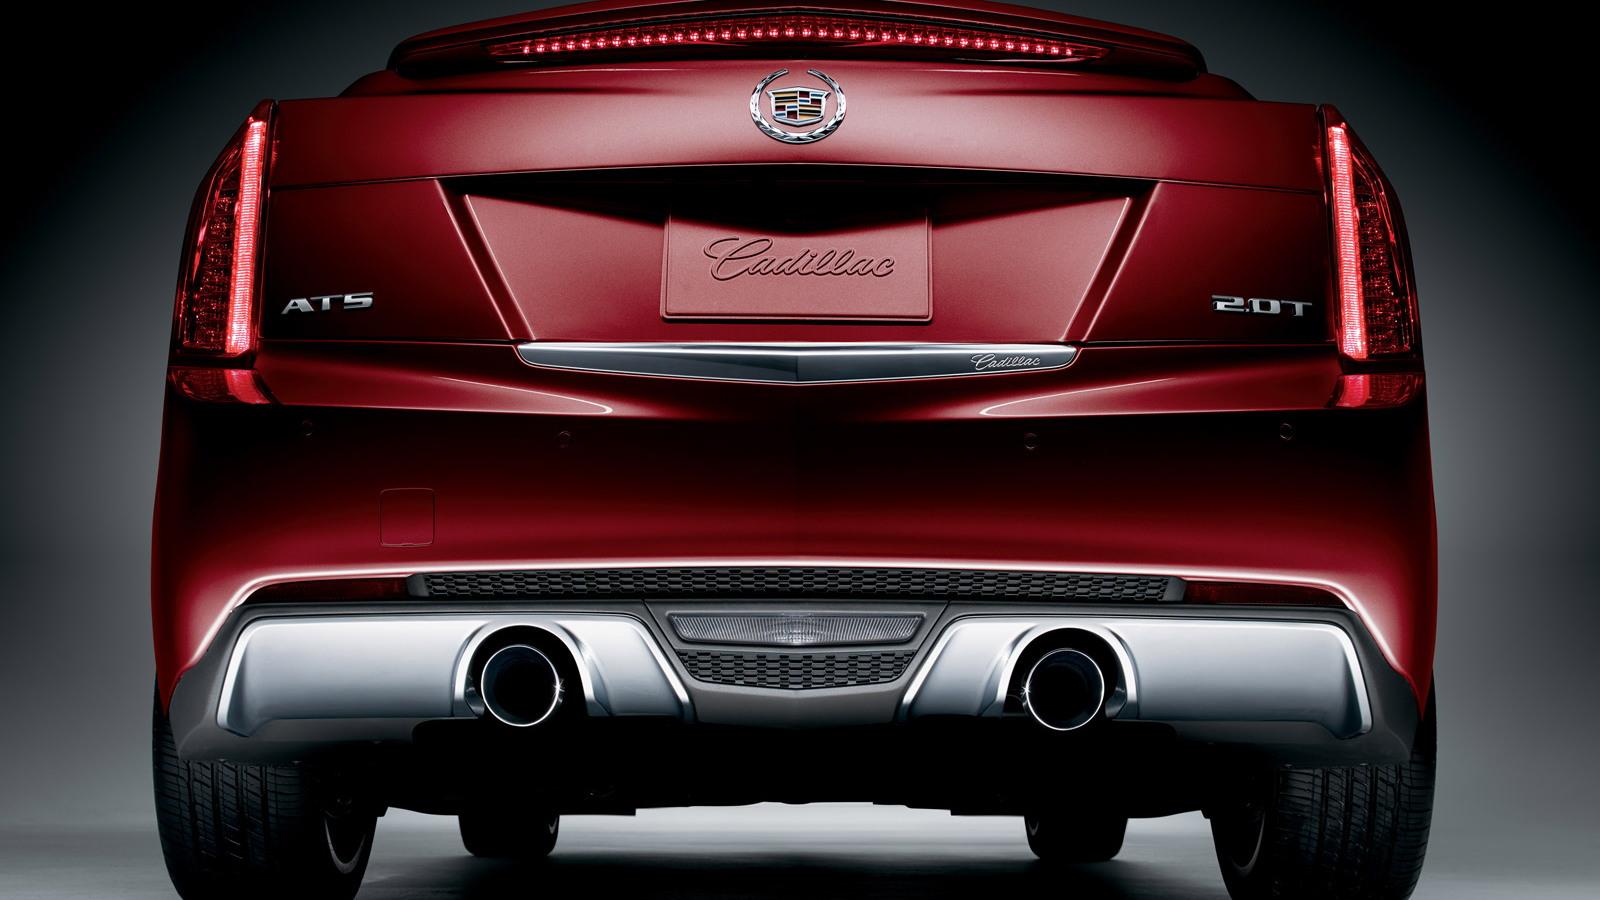 2014 Cadillac ATS Crimson Sport